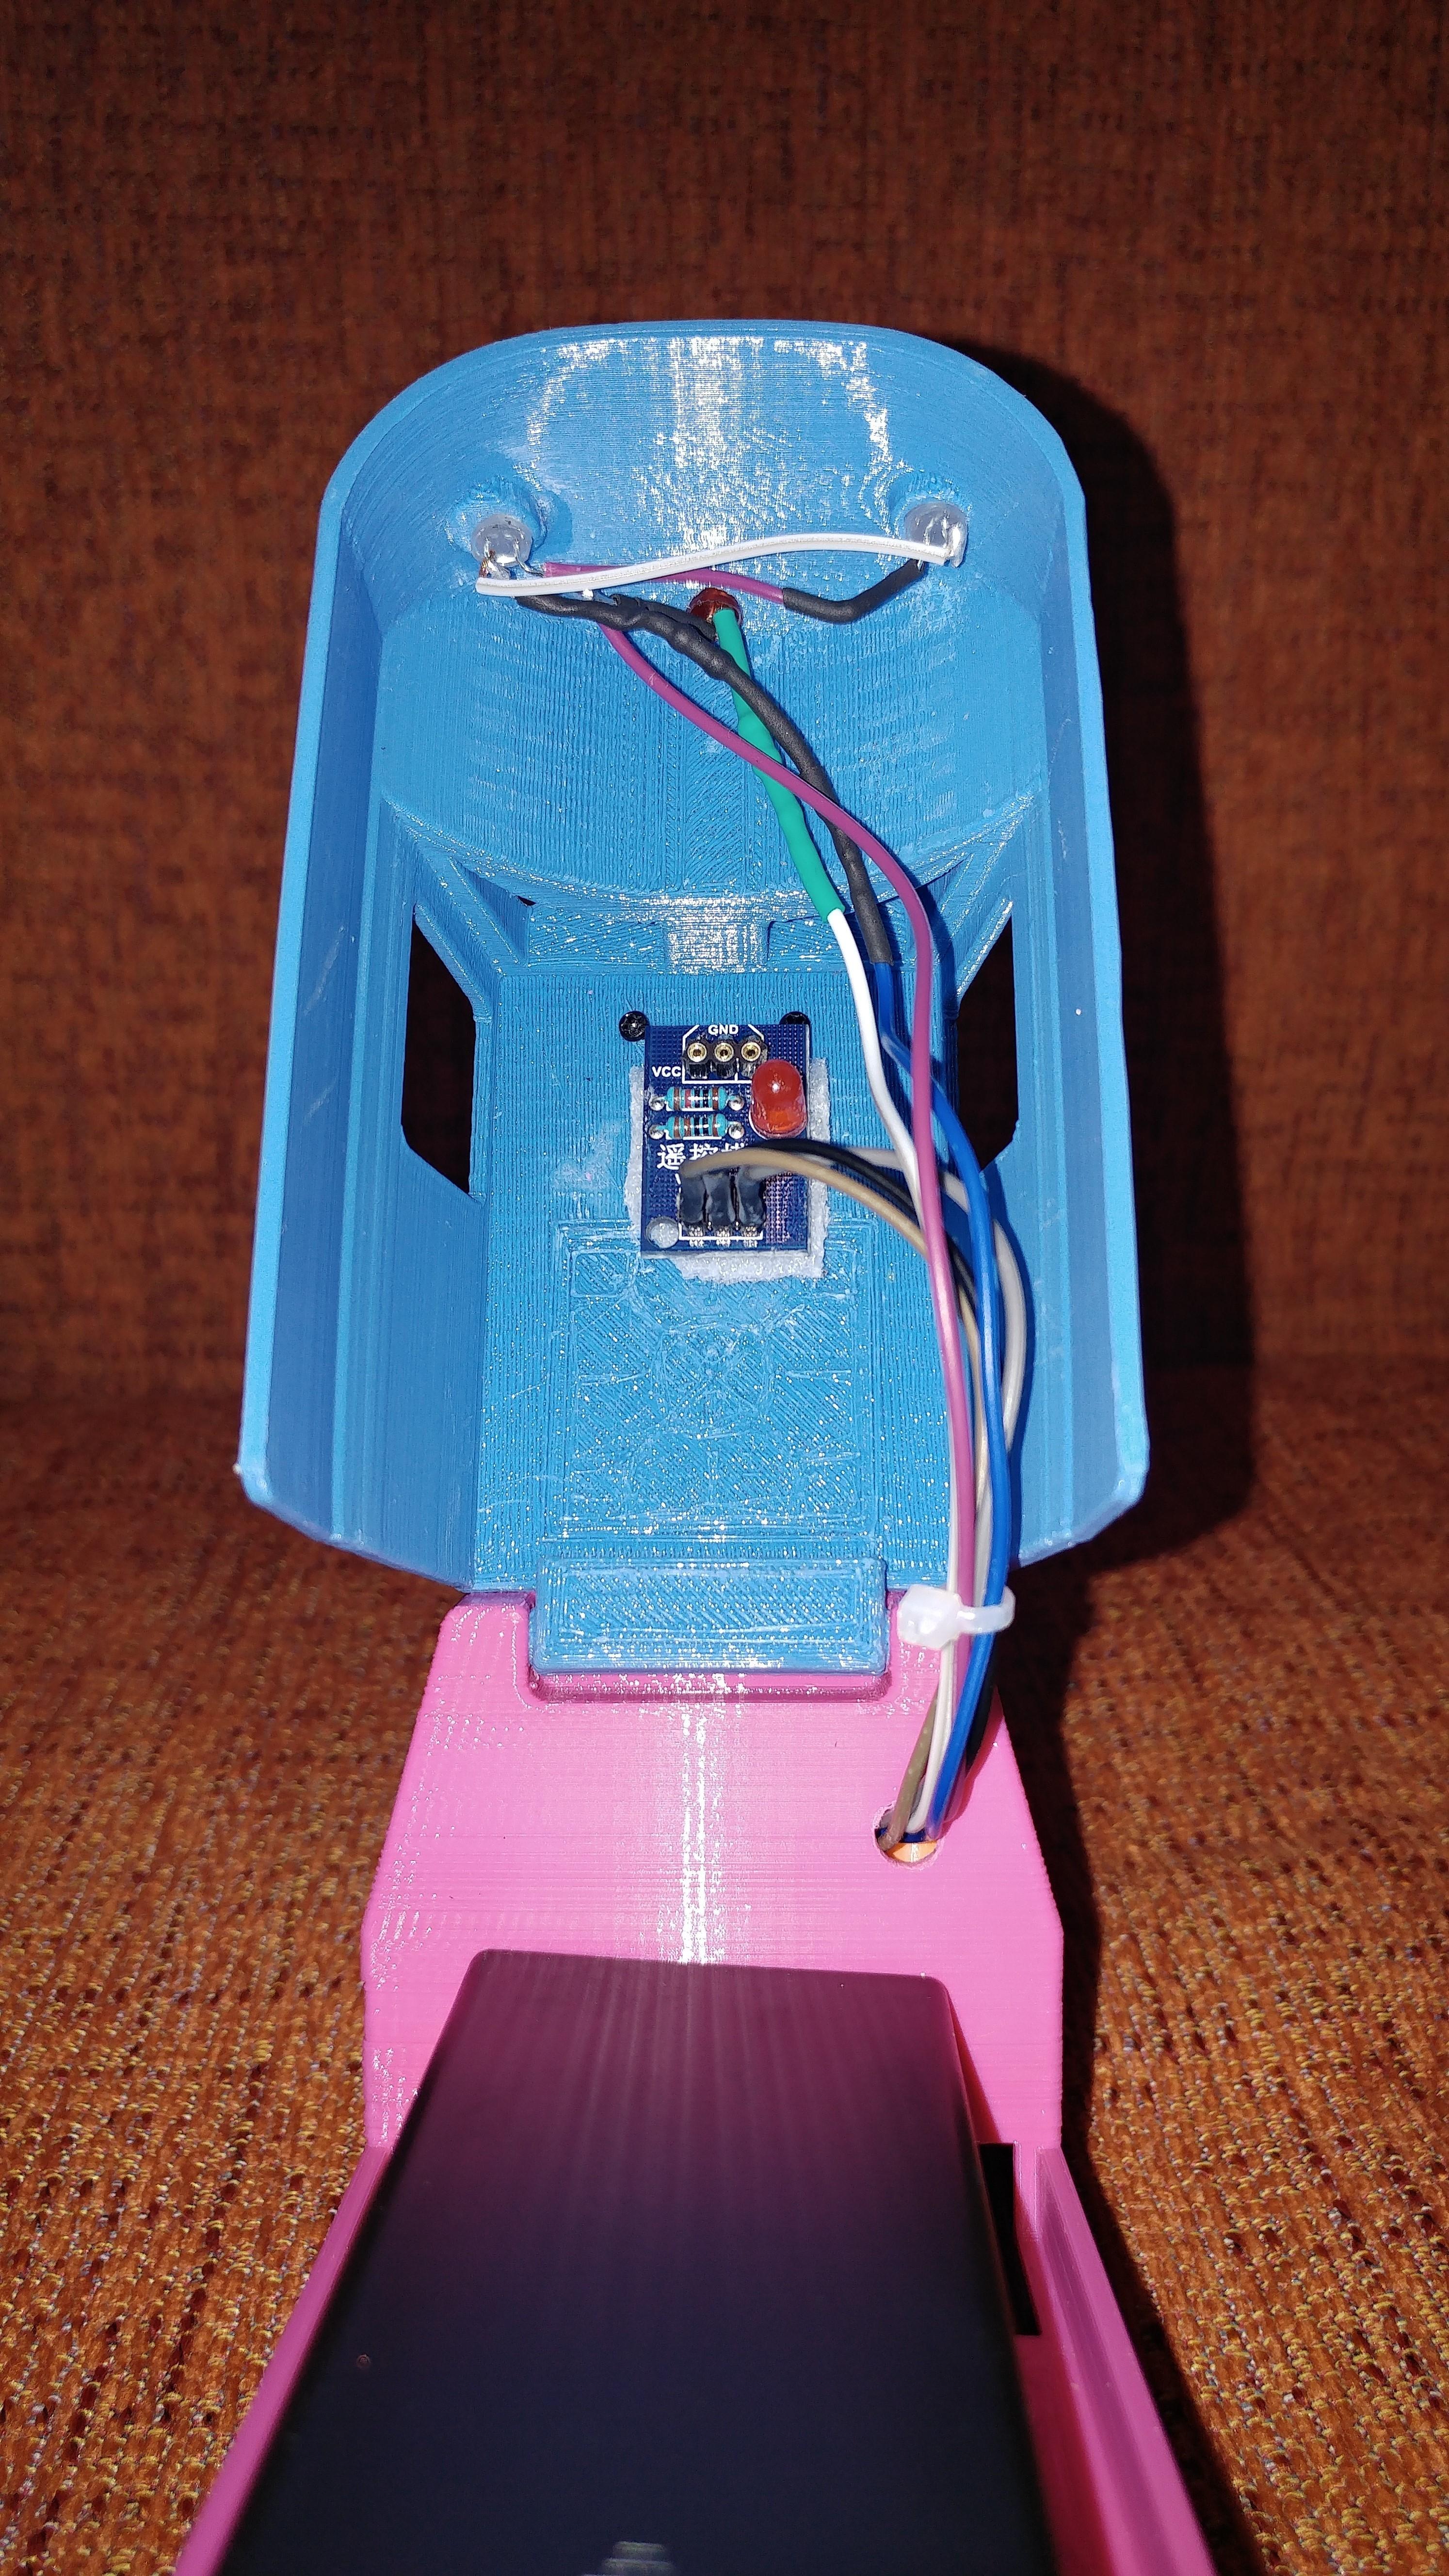 20181222_211133.jpg Télécharger fichier STL gratuit Tren Lego Duplo Motorizado controlado por Infrarojos • Objet à imprimer en 3D, celtarra12